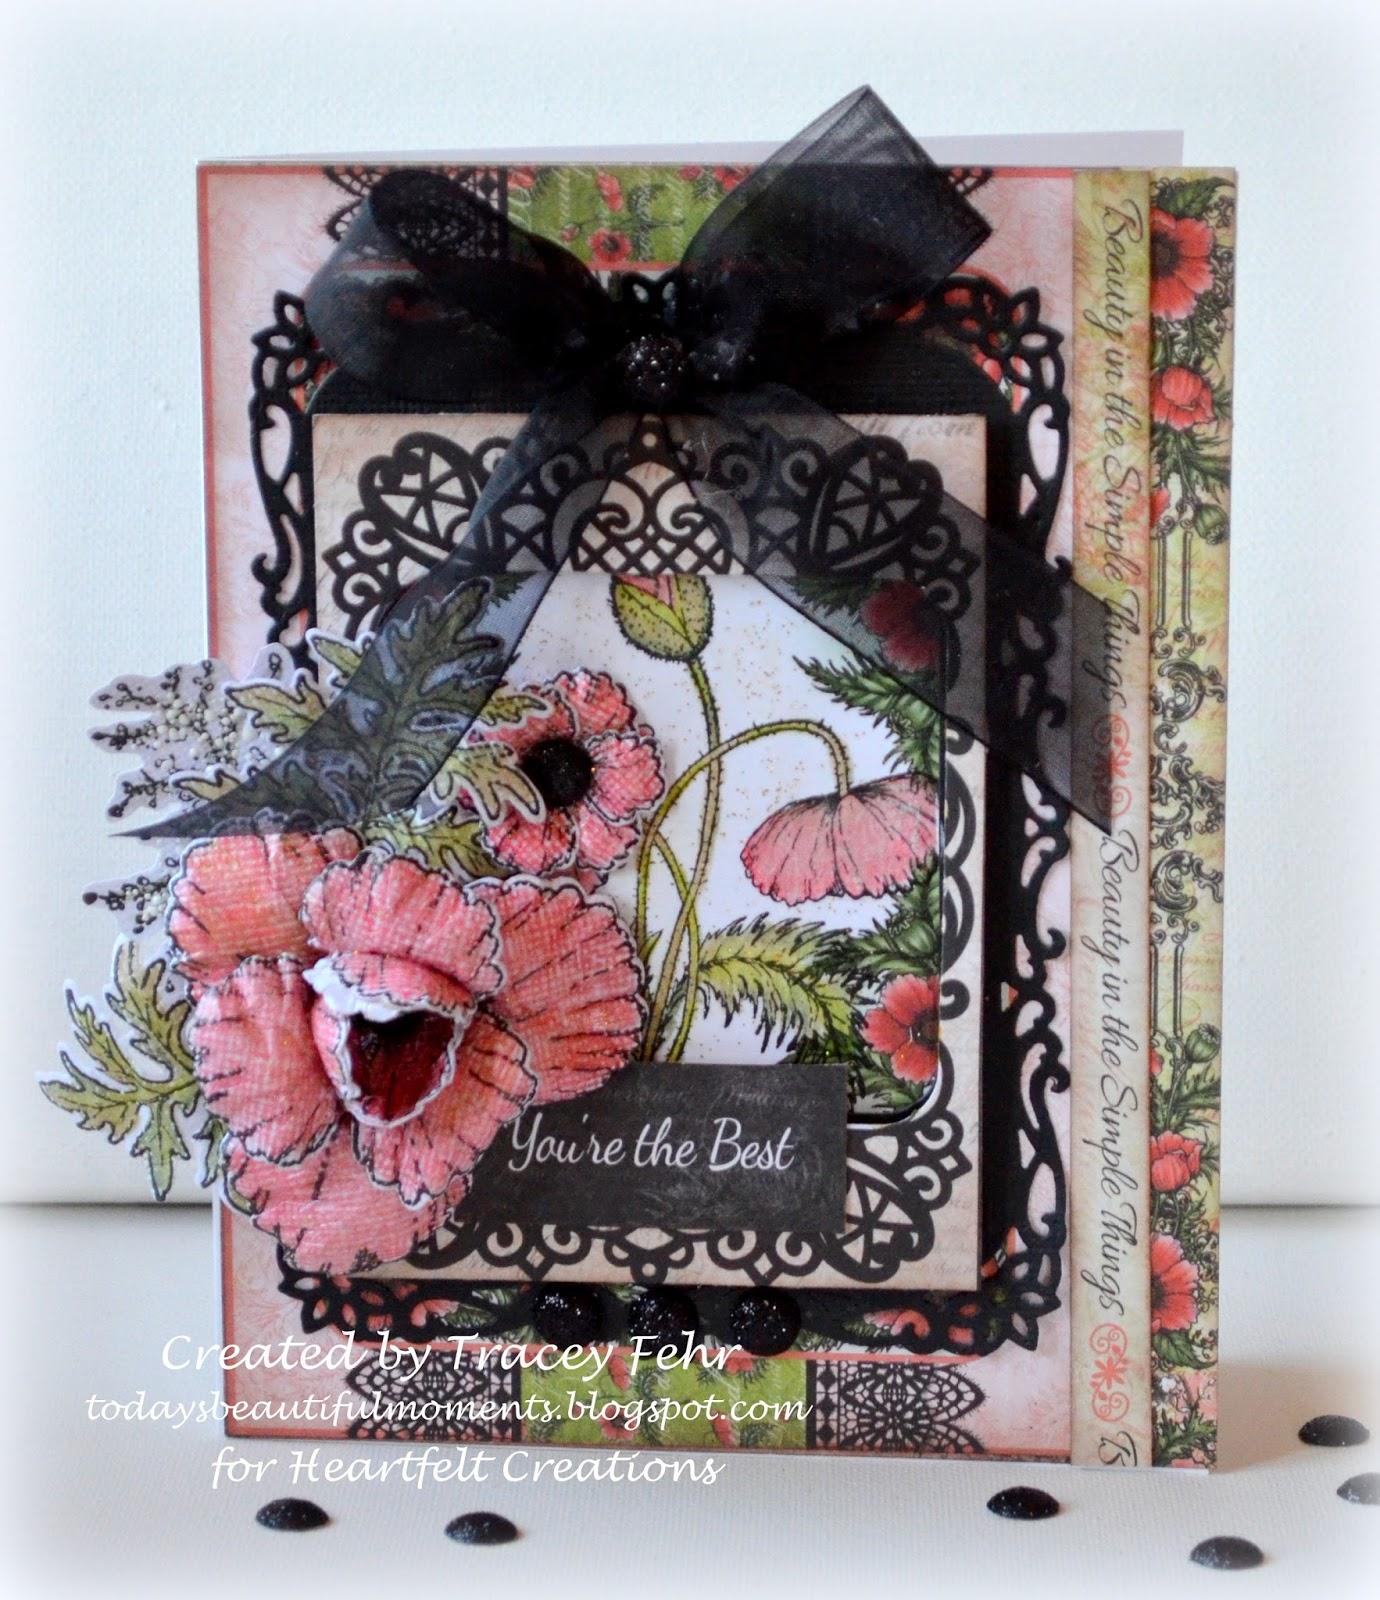 Heartfelt Creations Cling Rubber Stamp Set ~ Blazing Poppy Stems HCPC3677 RETIRED!